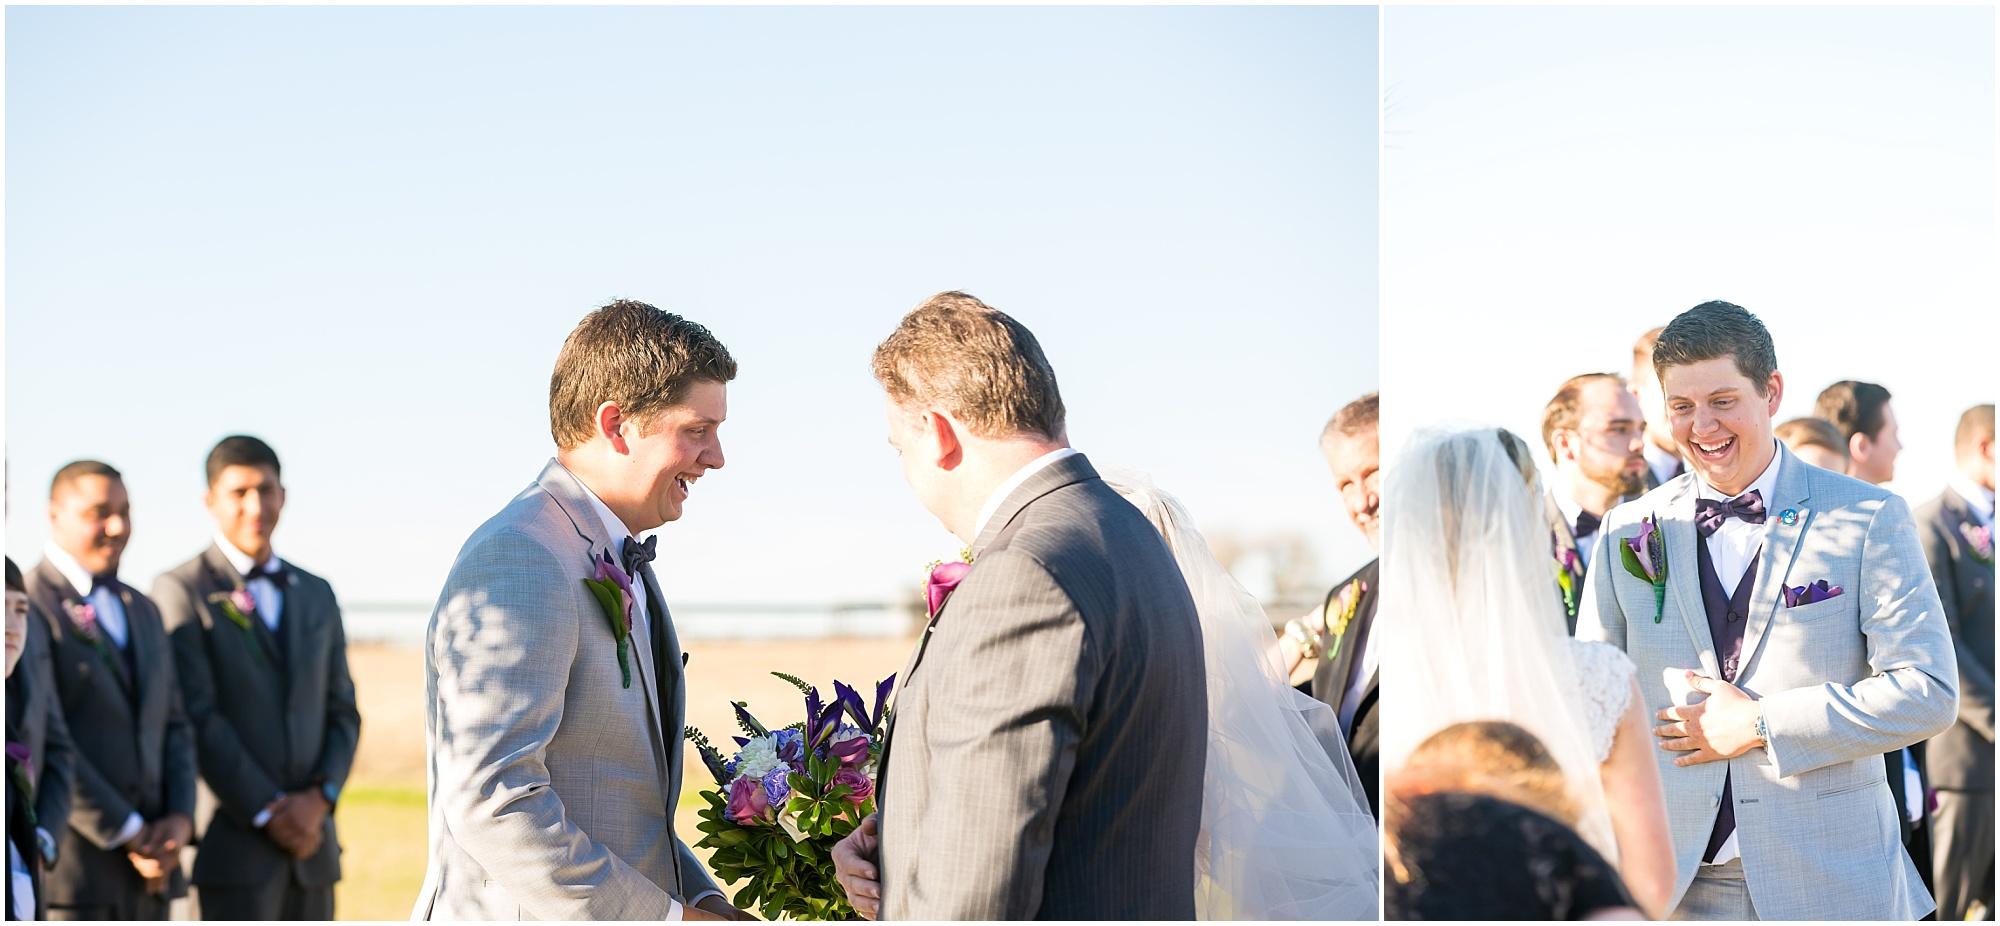 Disney-Inspired-Wedding-Central-Texas_0034.jpg